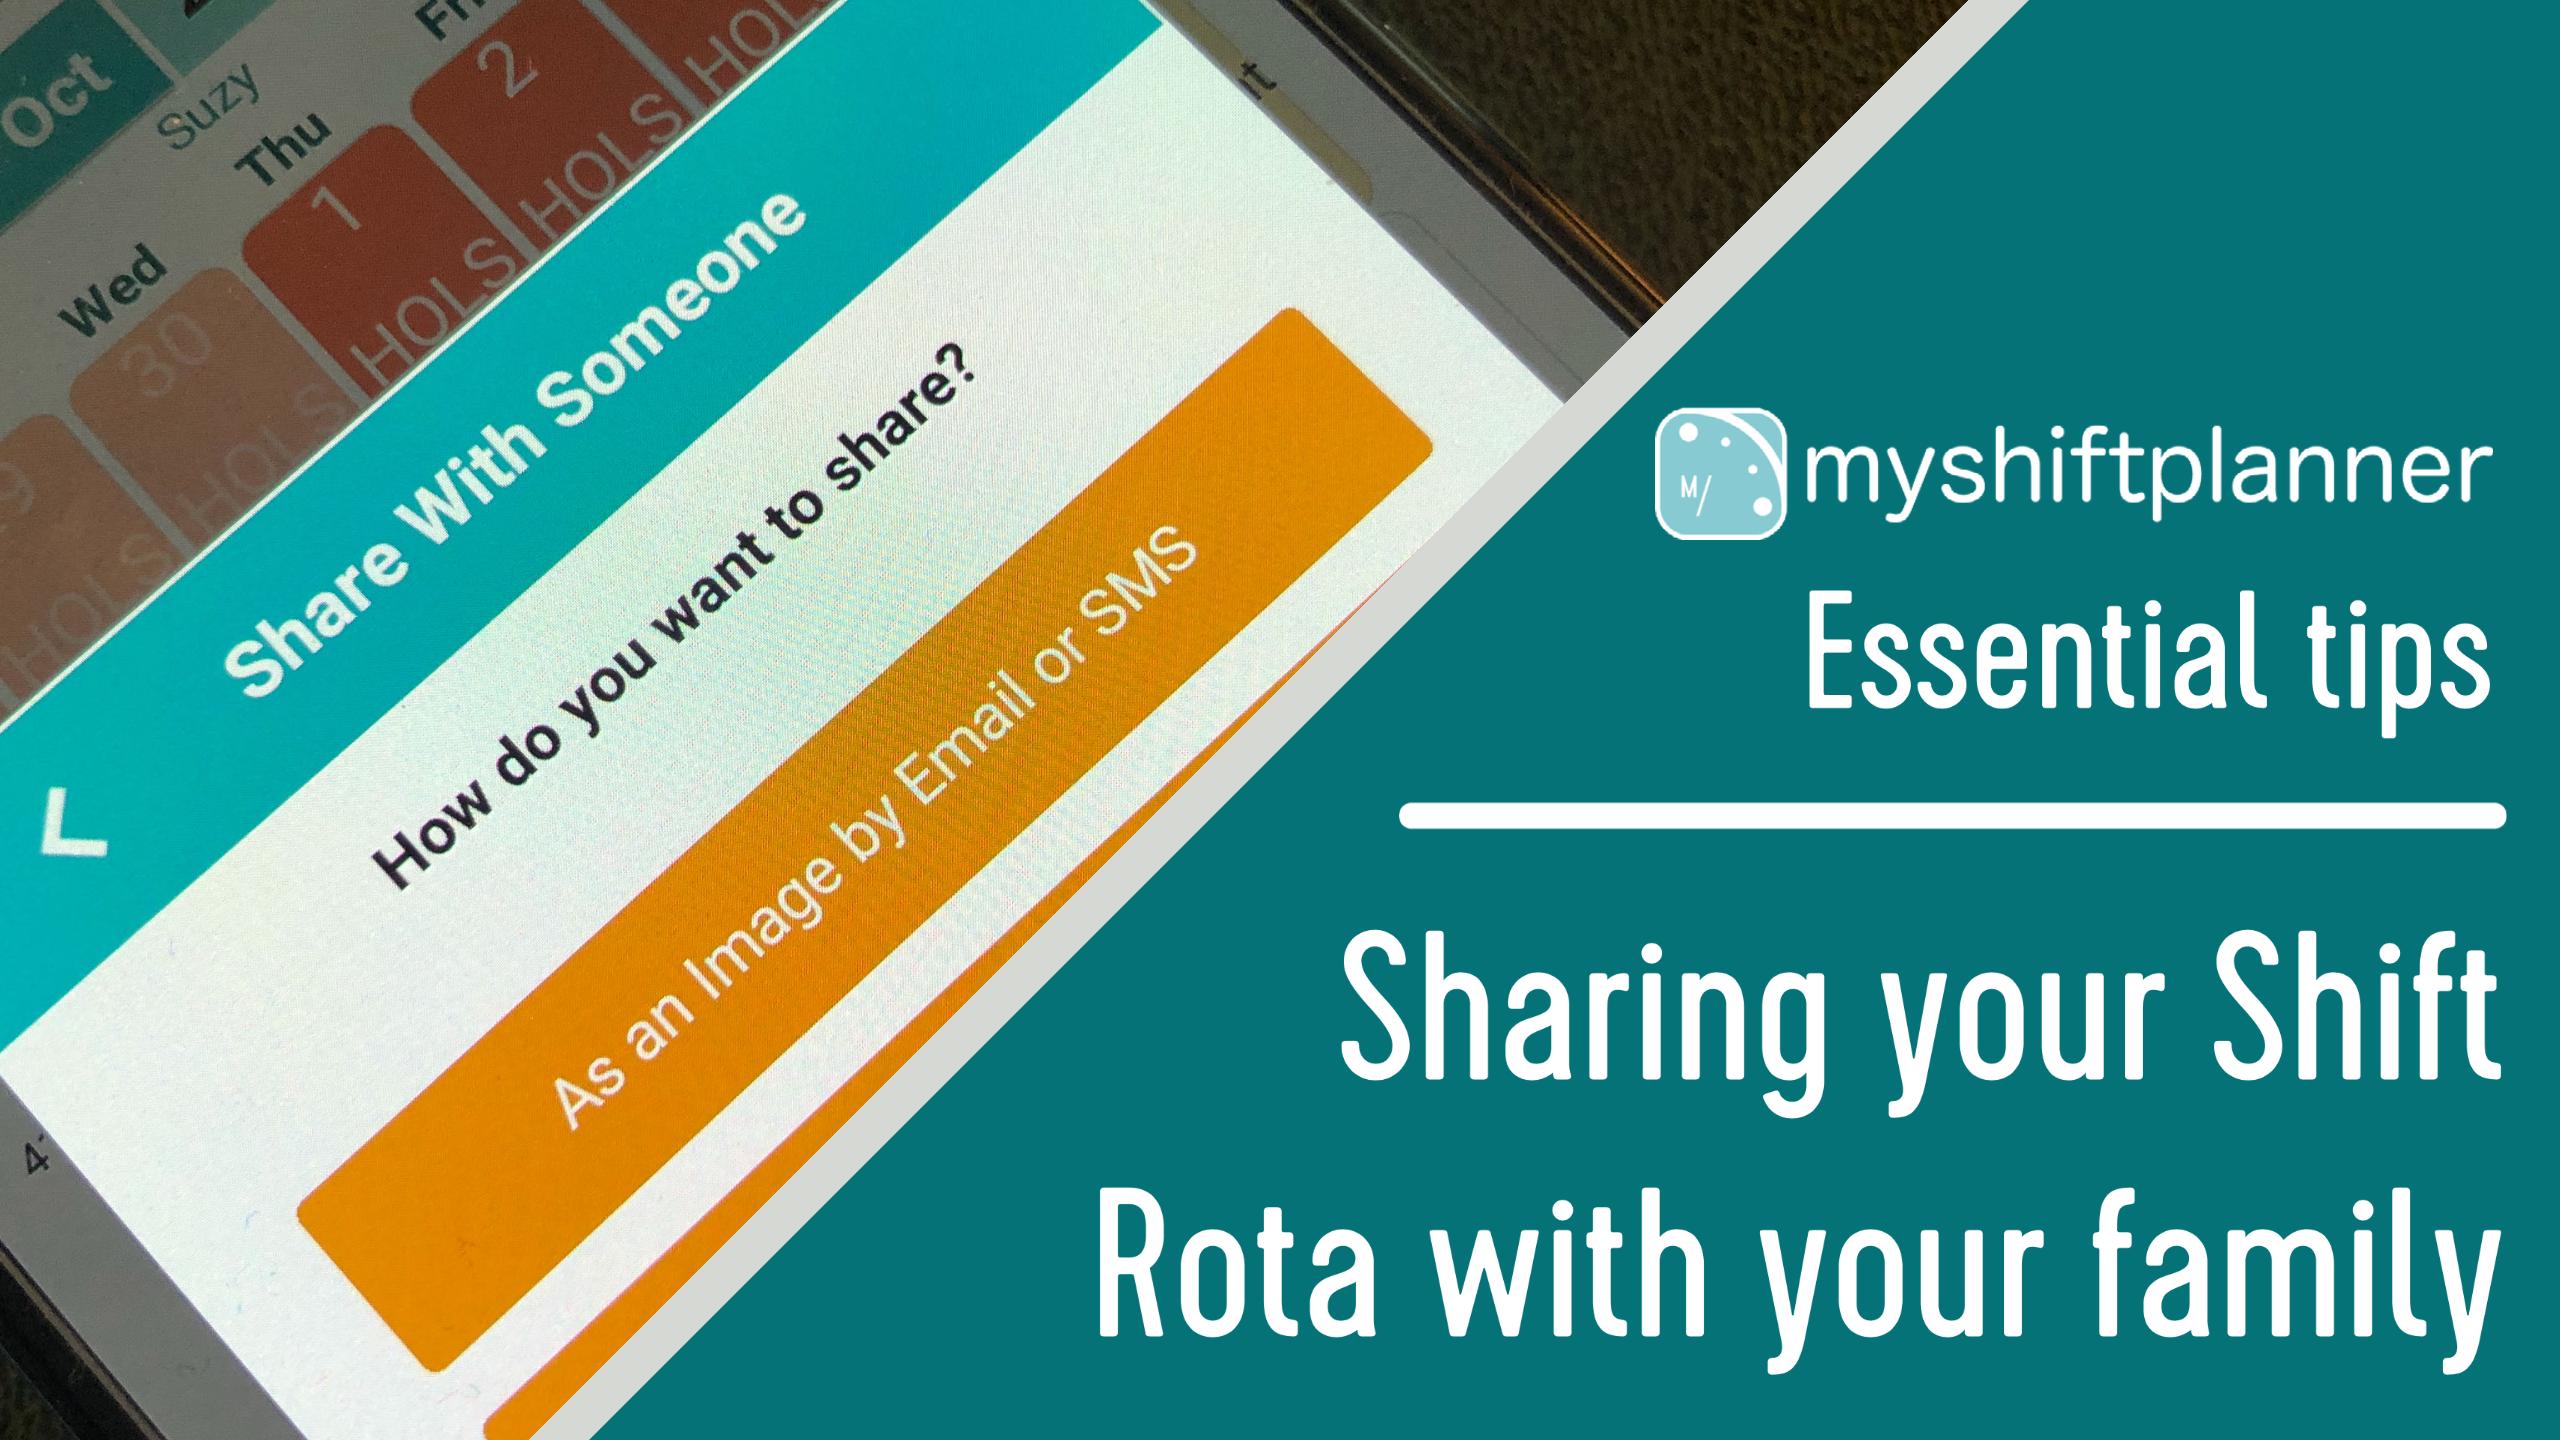 Sharing your shift rota